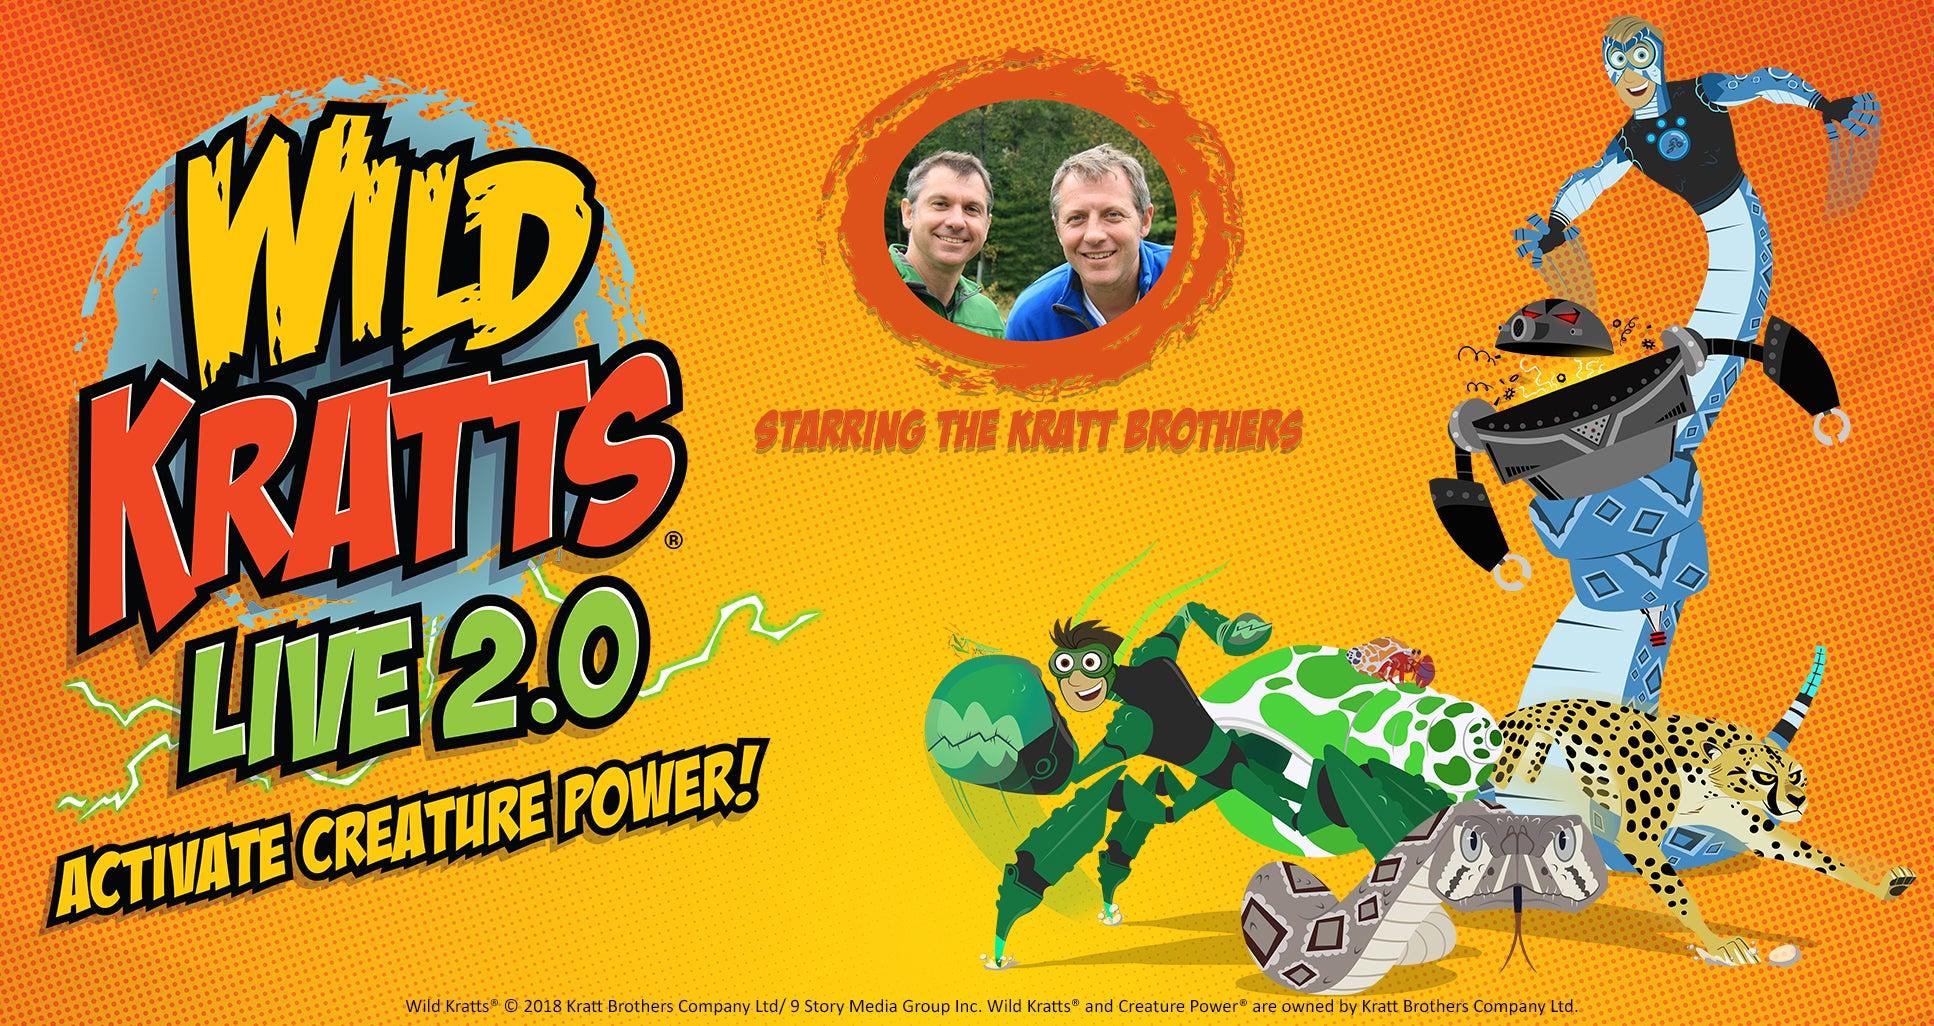 Wild Kratts LIVE 2.0 – Activate Creature Power!